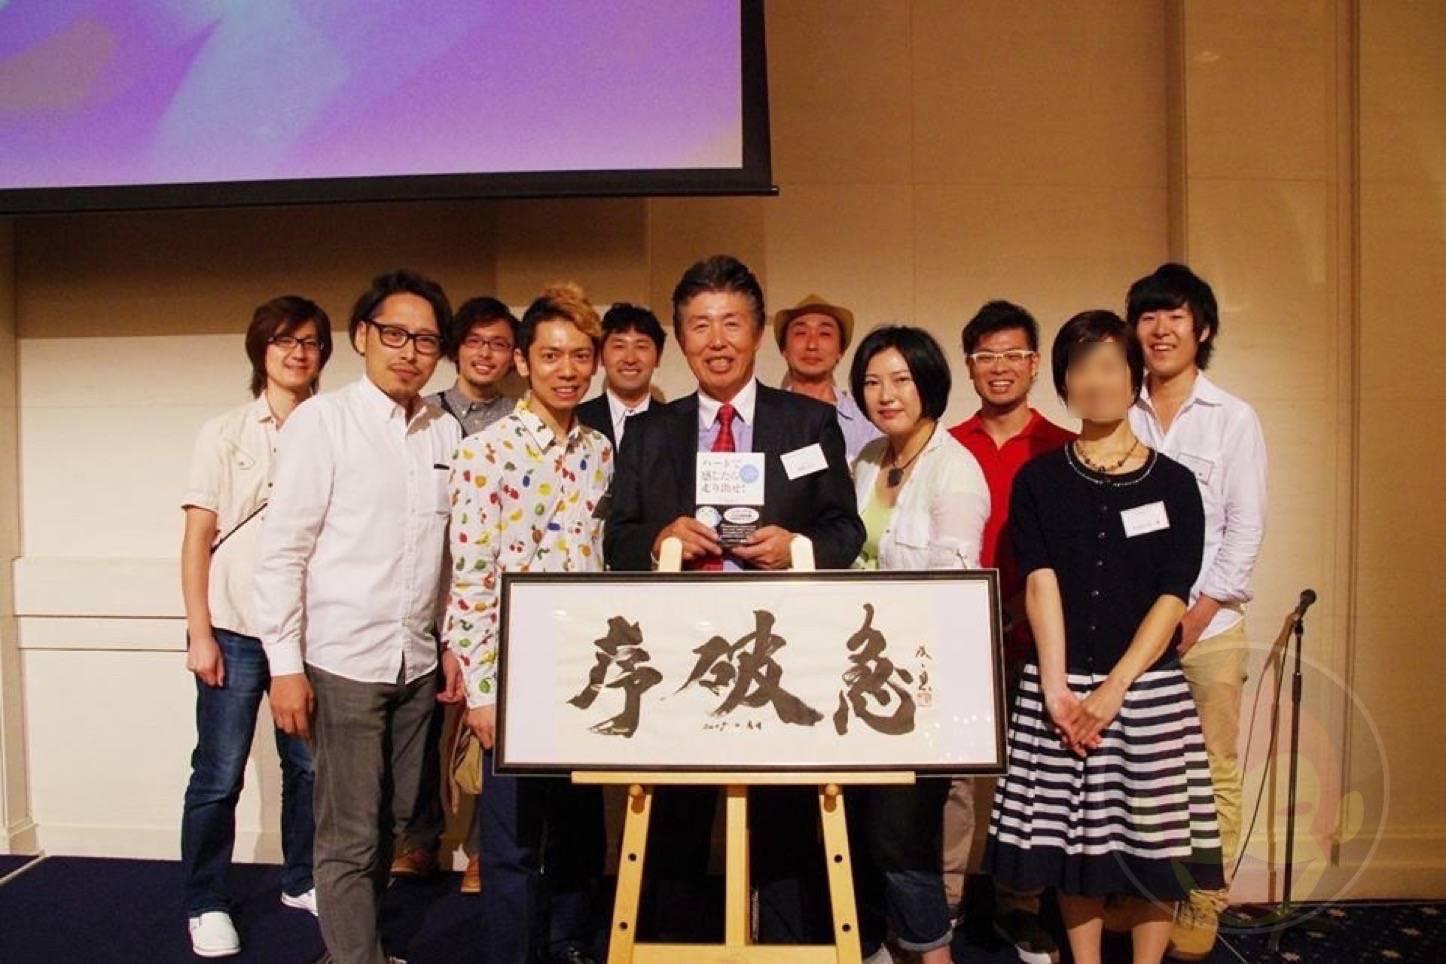 Hikari tv blogger event